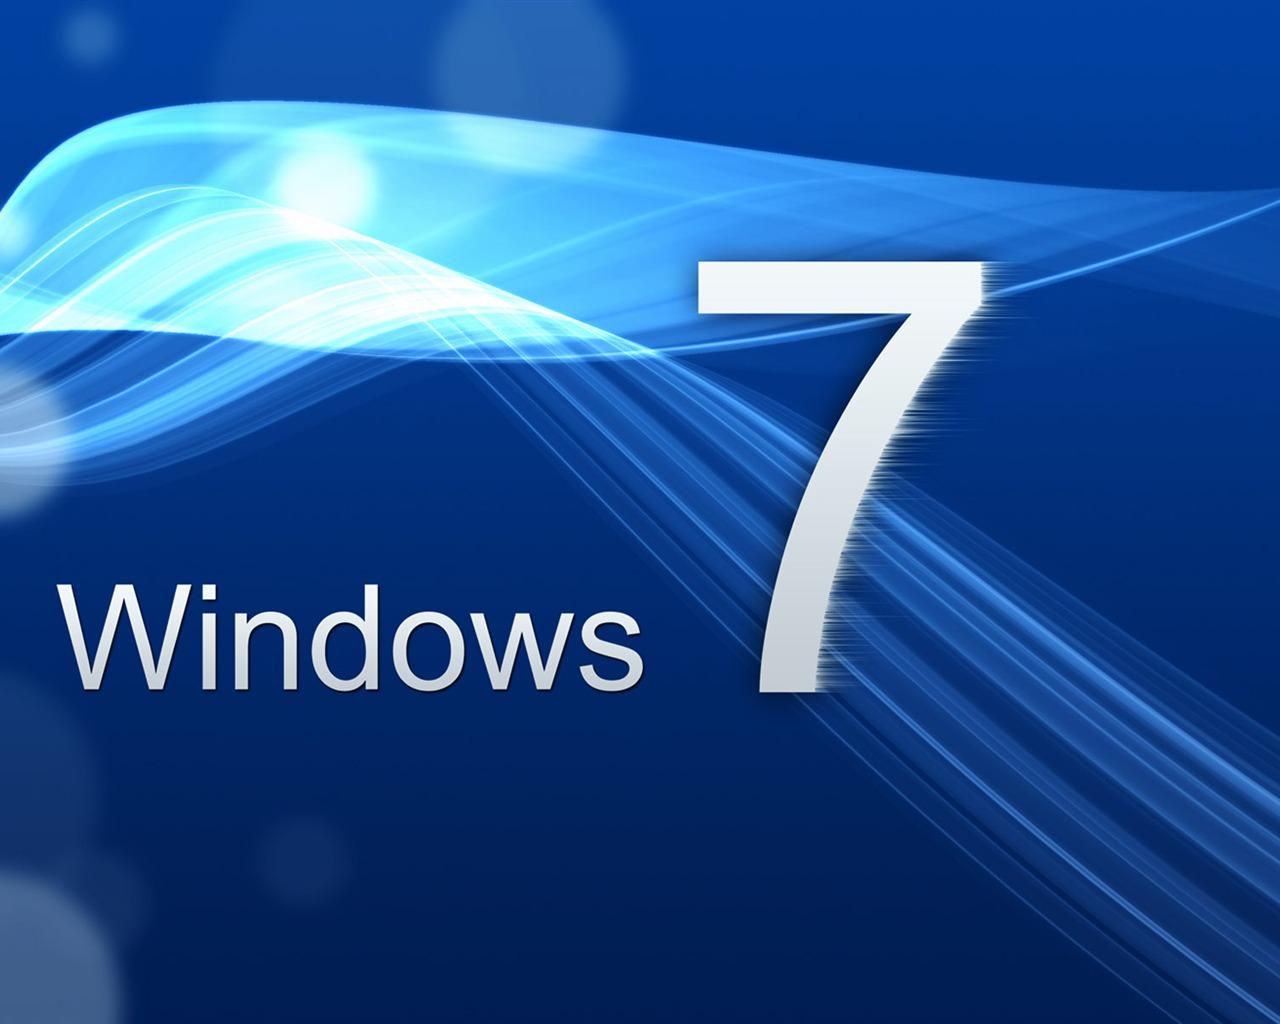 blogspotcom201304live wallpaper for windows 7html 1280x1024